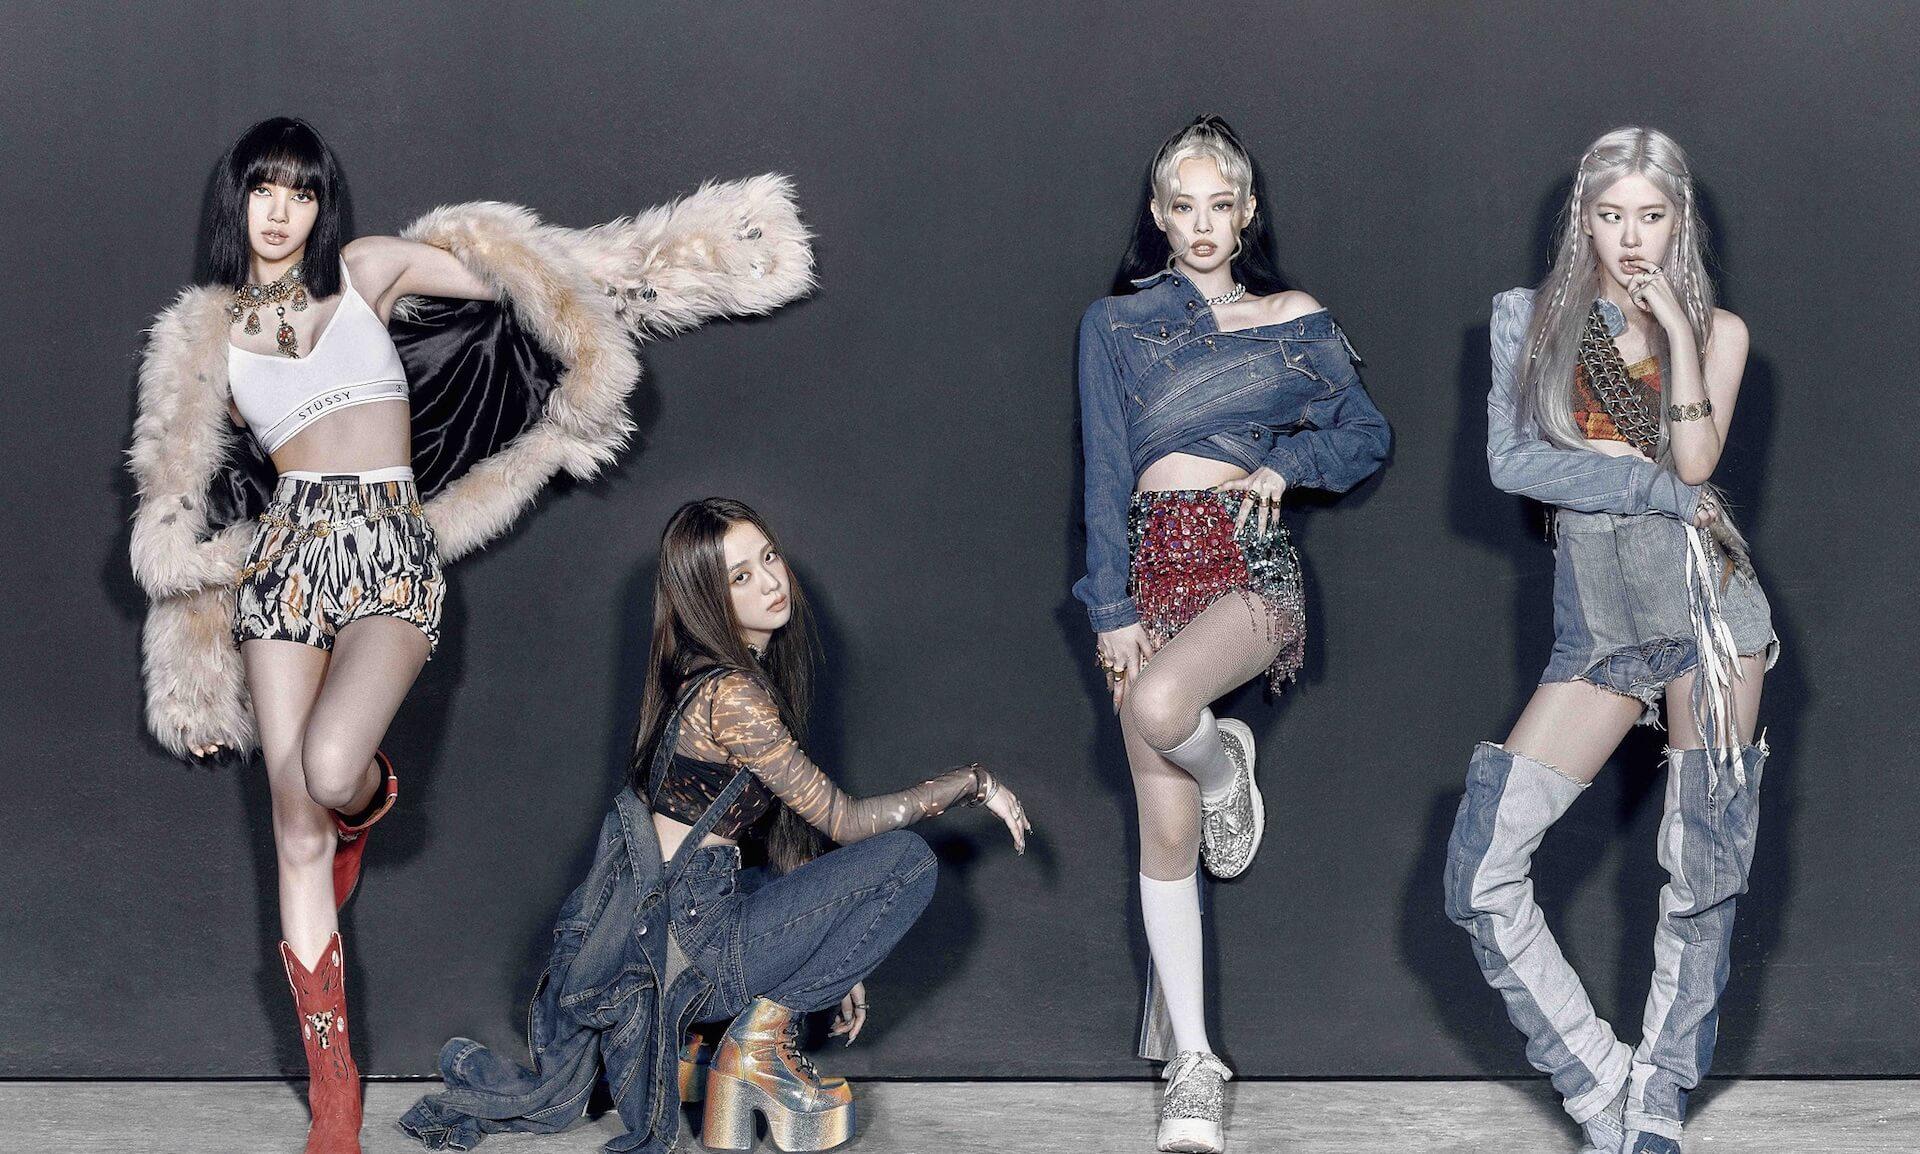 "BLACKPINKが1年2ヶ月ぶりの新曲""How You Like That""を配信リリース!MV公開でSNS大反響&SPECIAL EDITION予約販売も開始 music200626_blackpink_3"